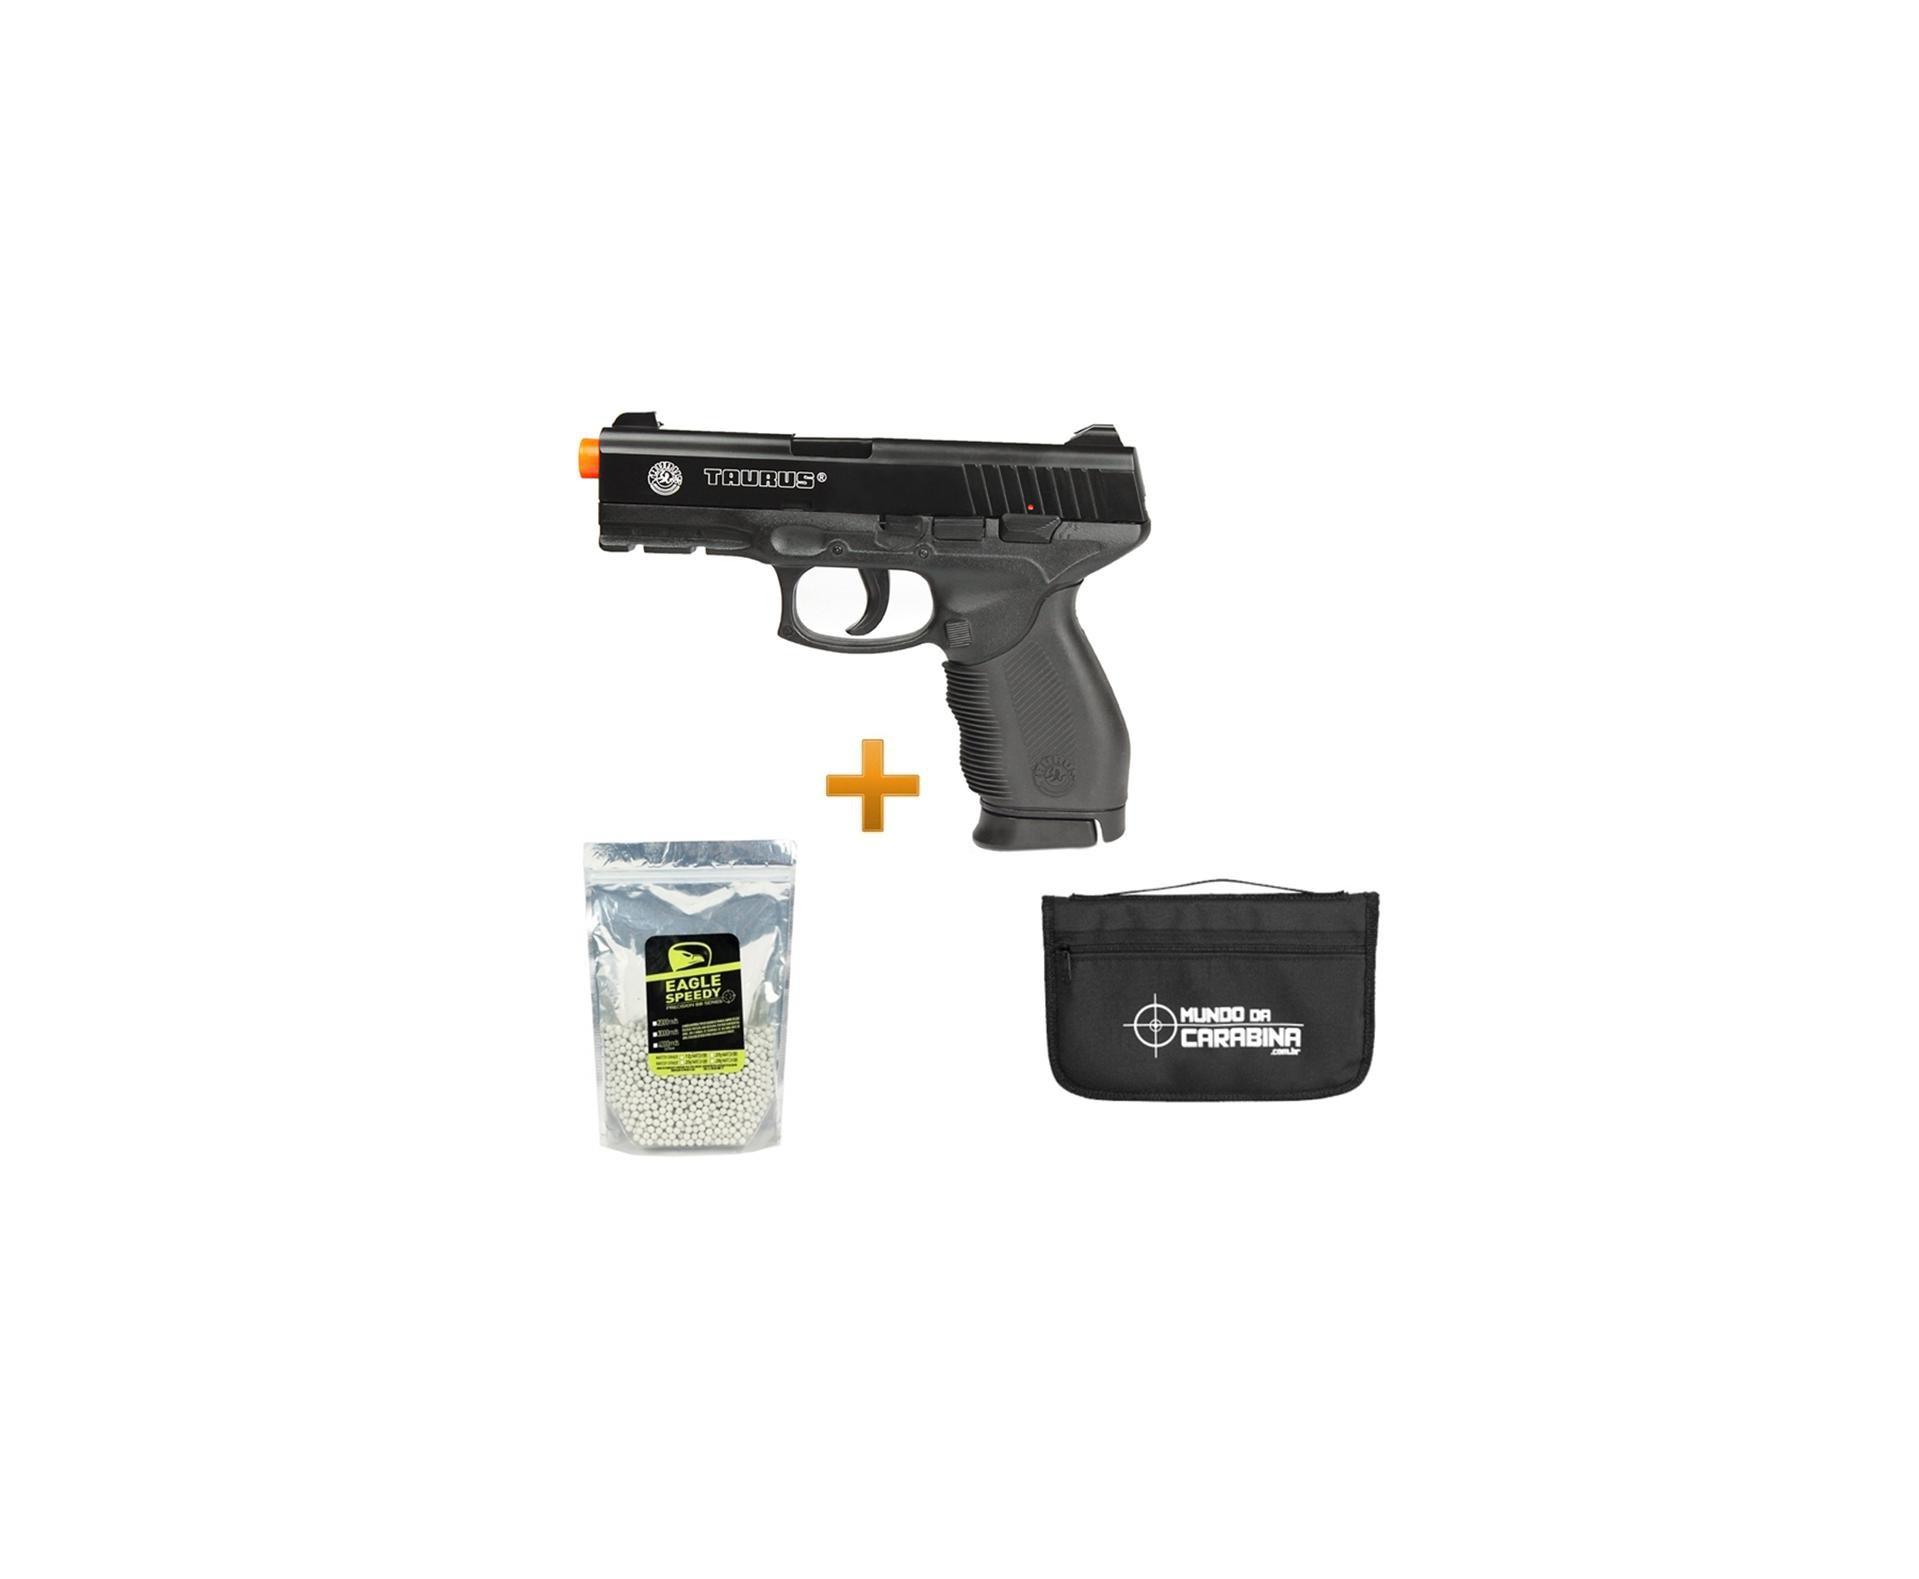 Pistola De Airsoft Taurus 24/7 Spring + 5000 Esferas 0,12g + Capa Almofada